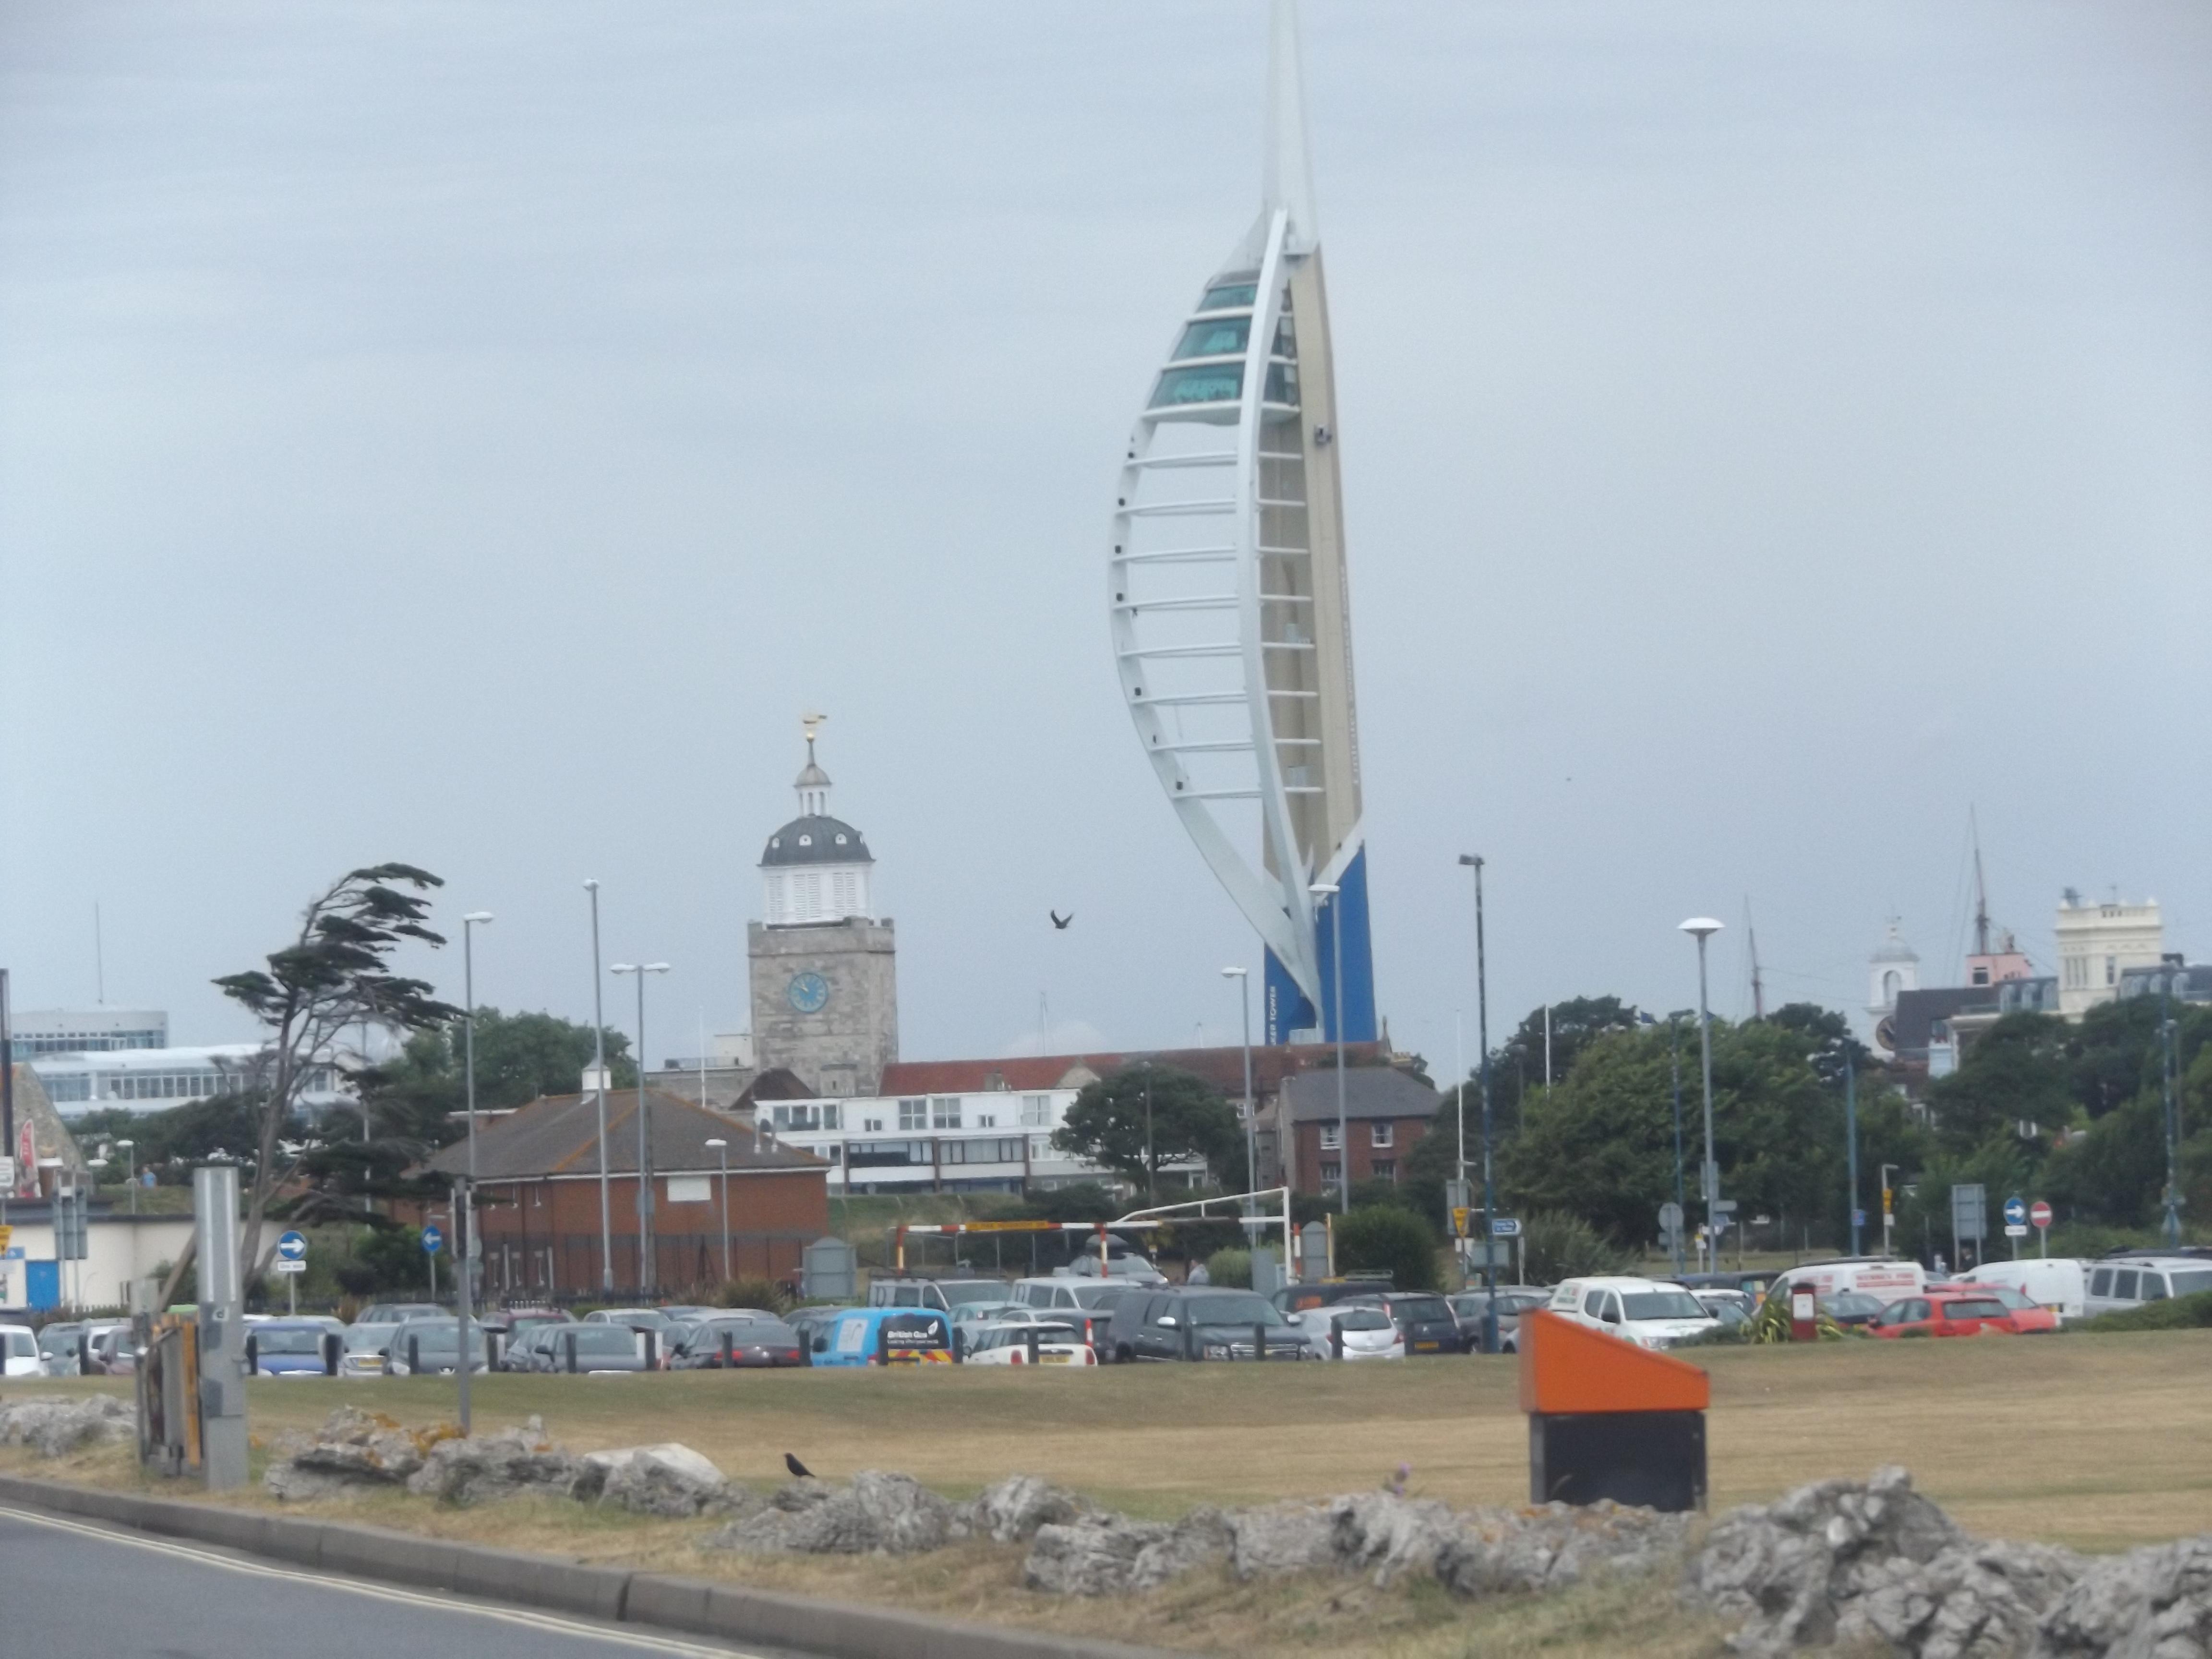 26-spinnaker-tower-portsmouth